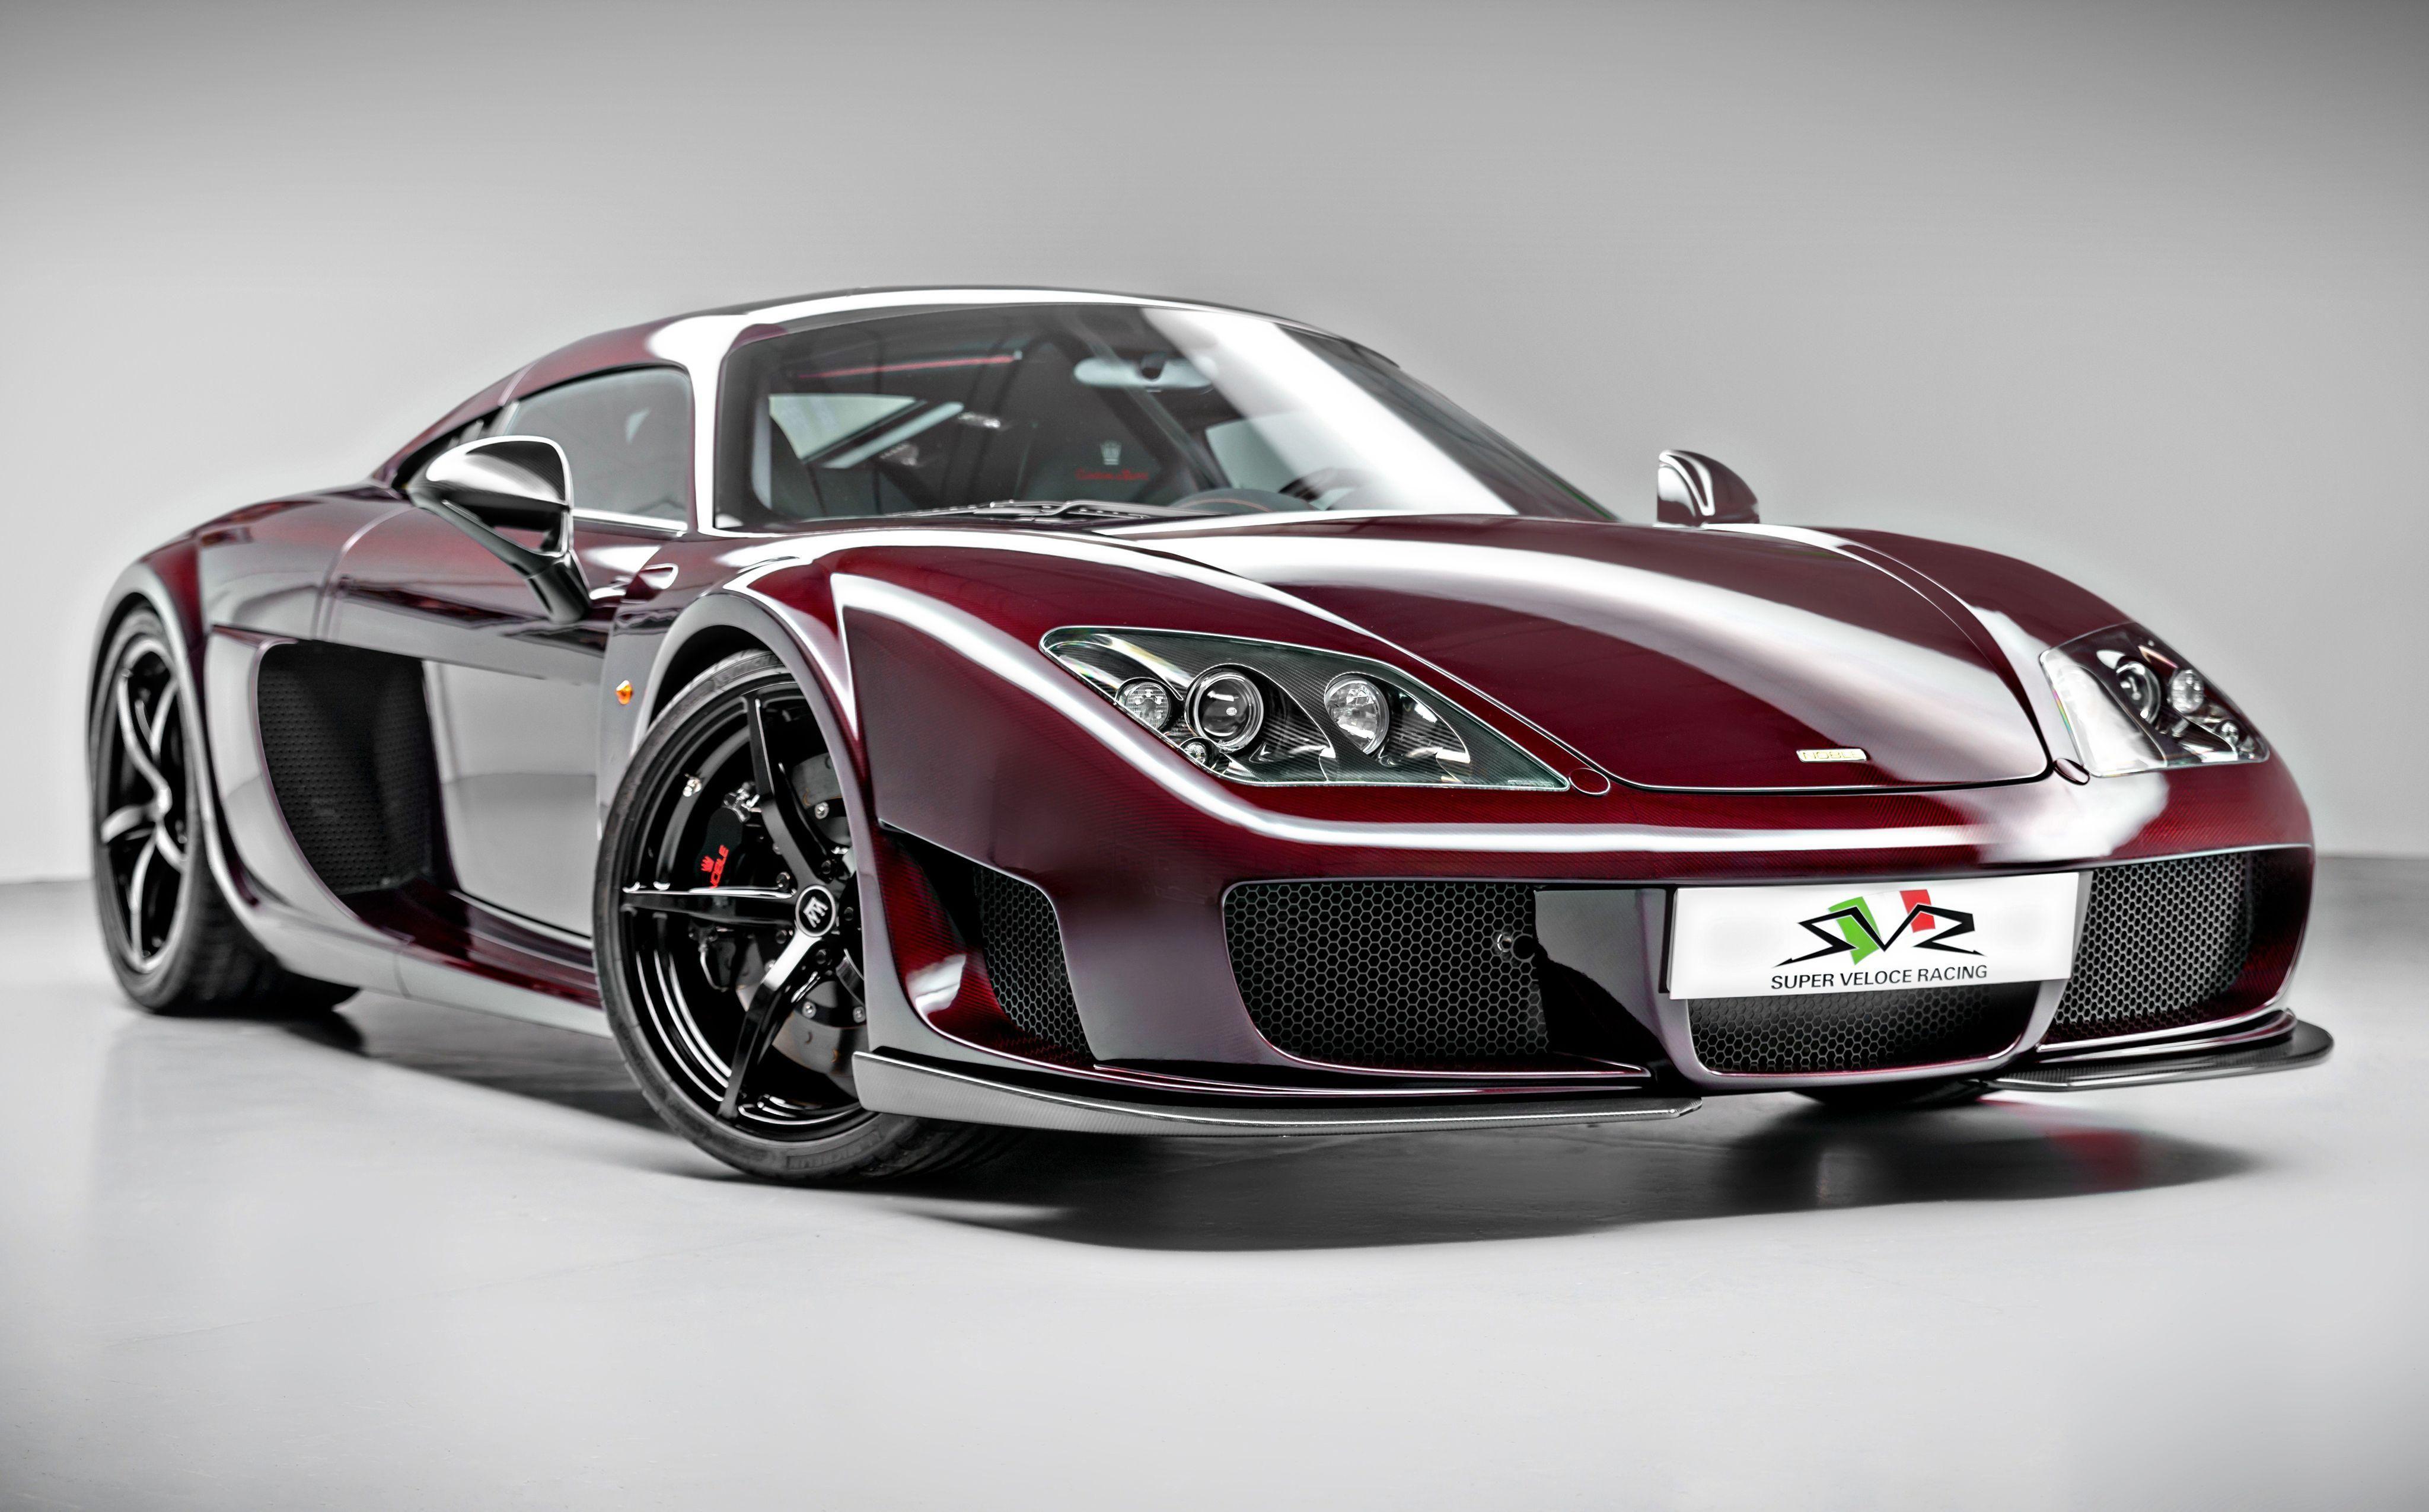 2016 Noble M600 Carbon Sport Super Cars Burgundy Car Supercars For Sale